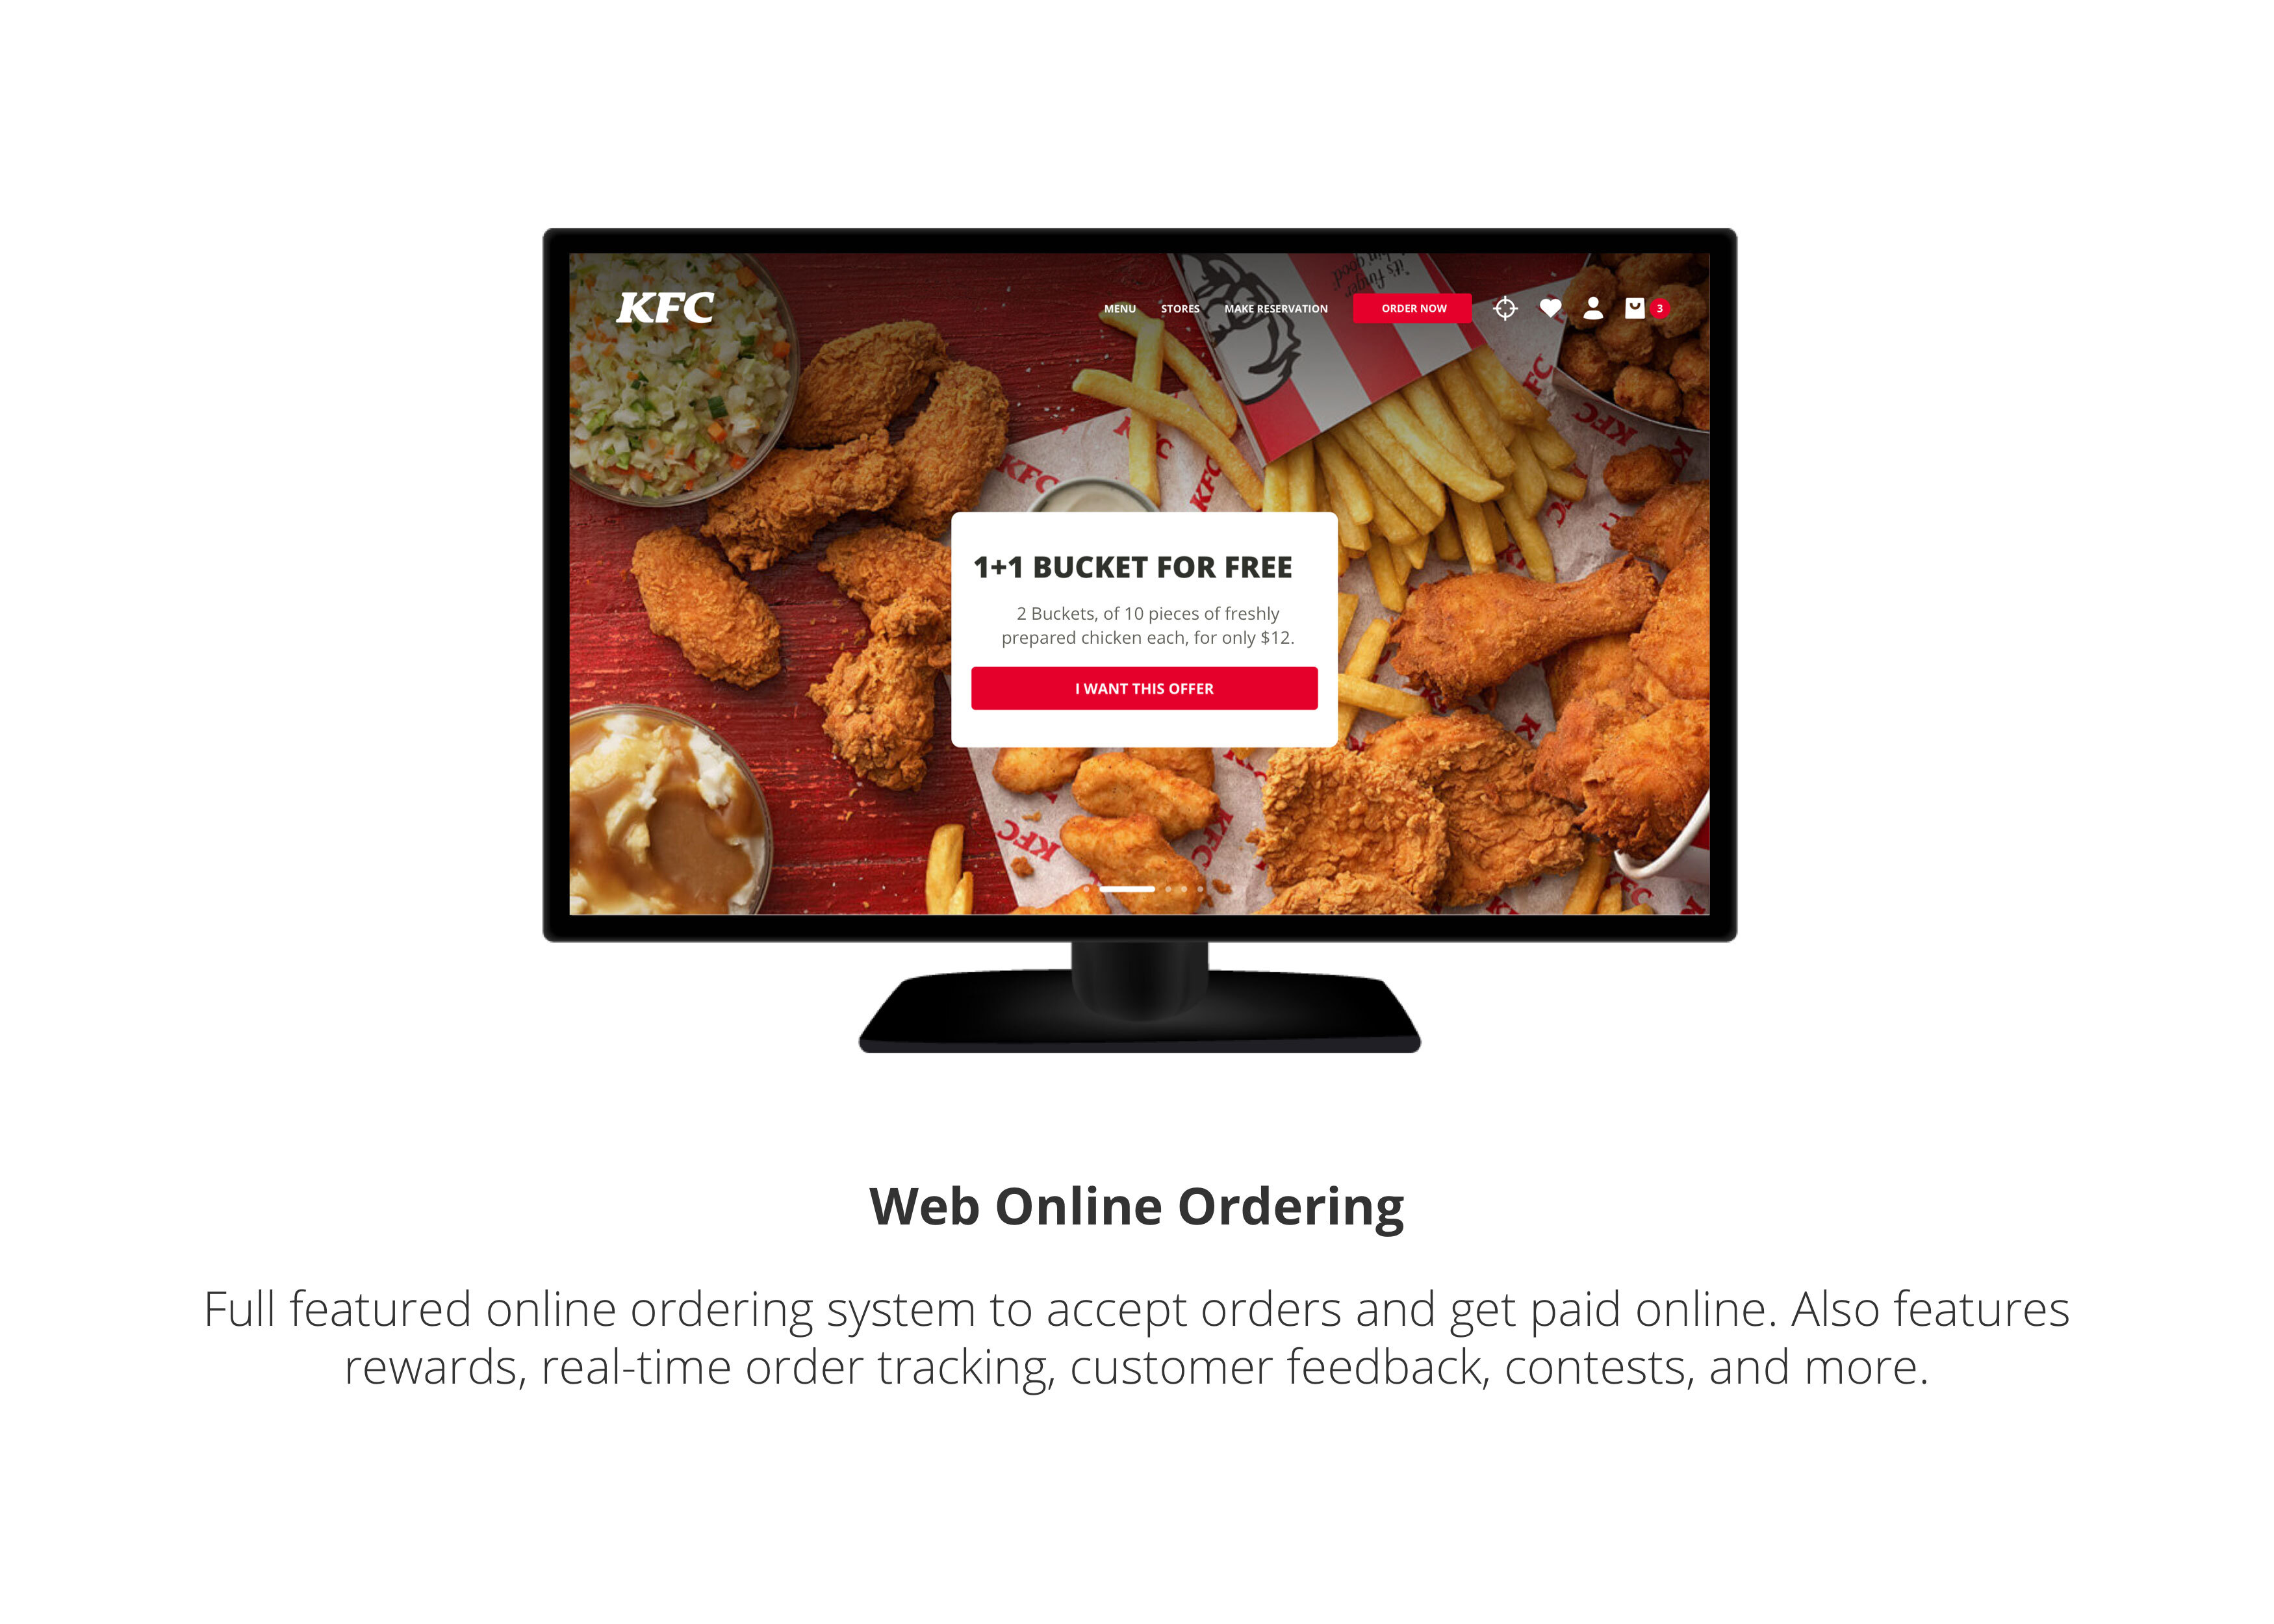 Web Online Ordering